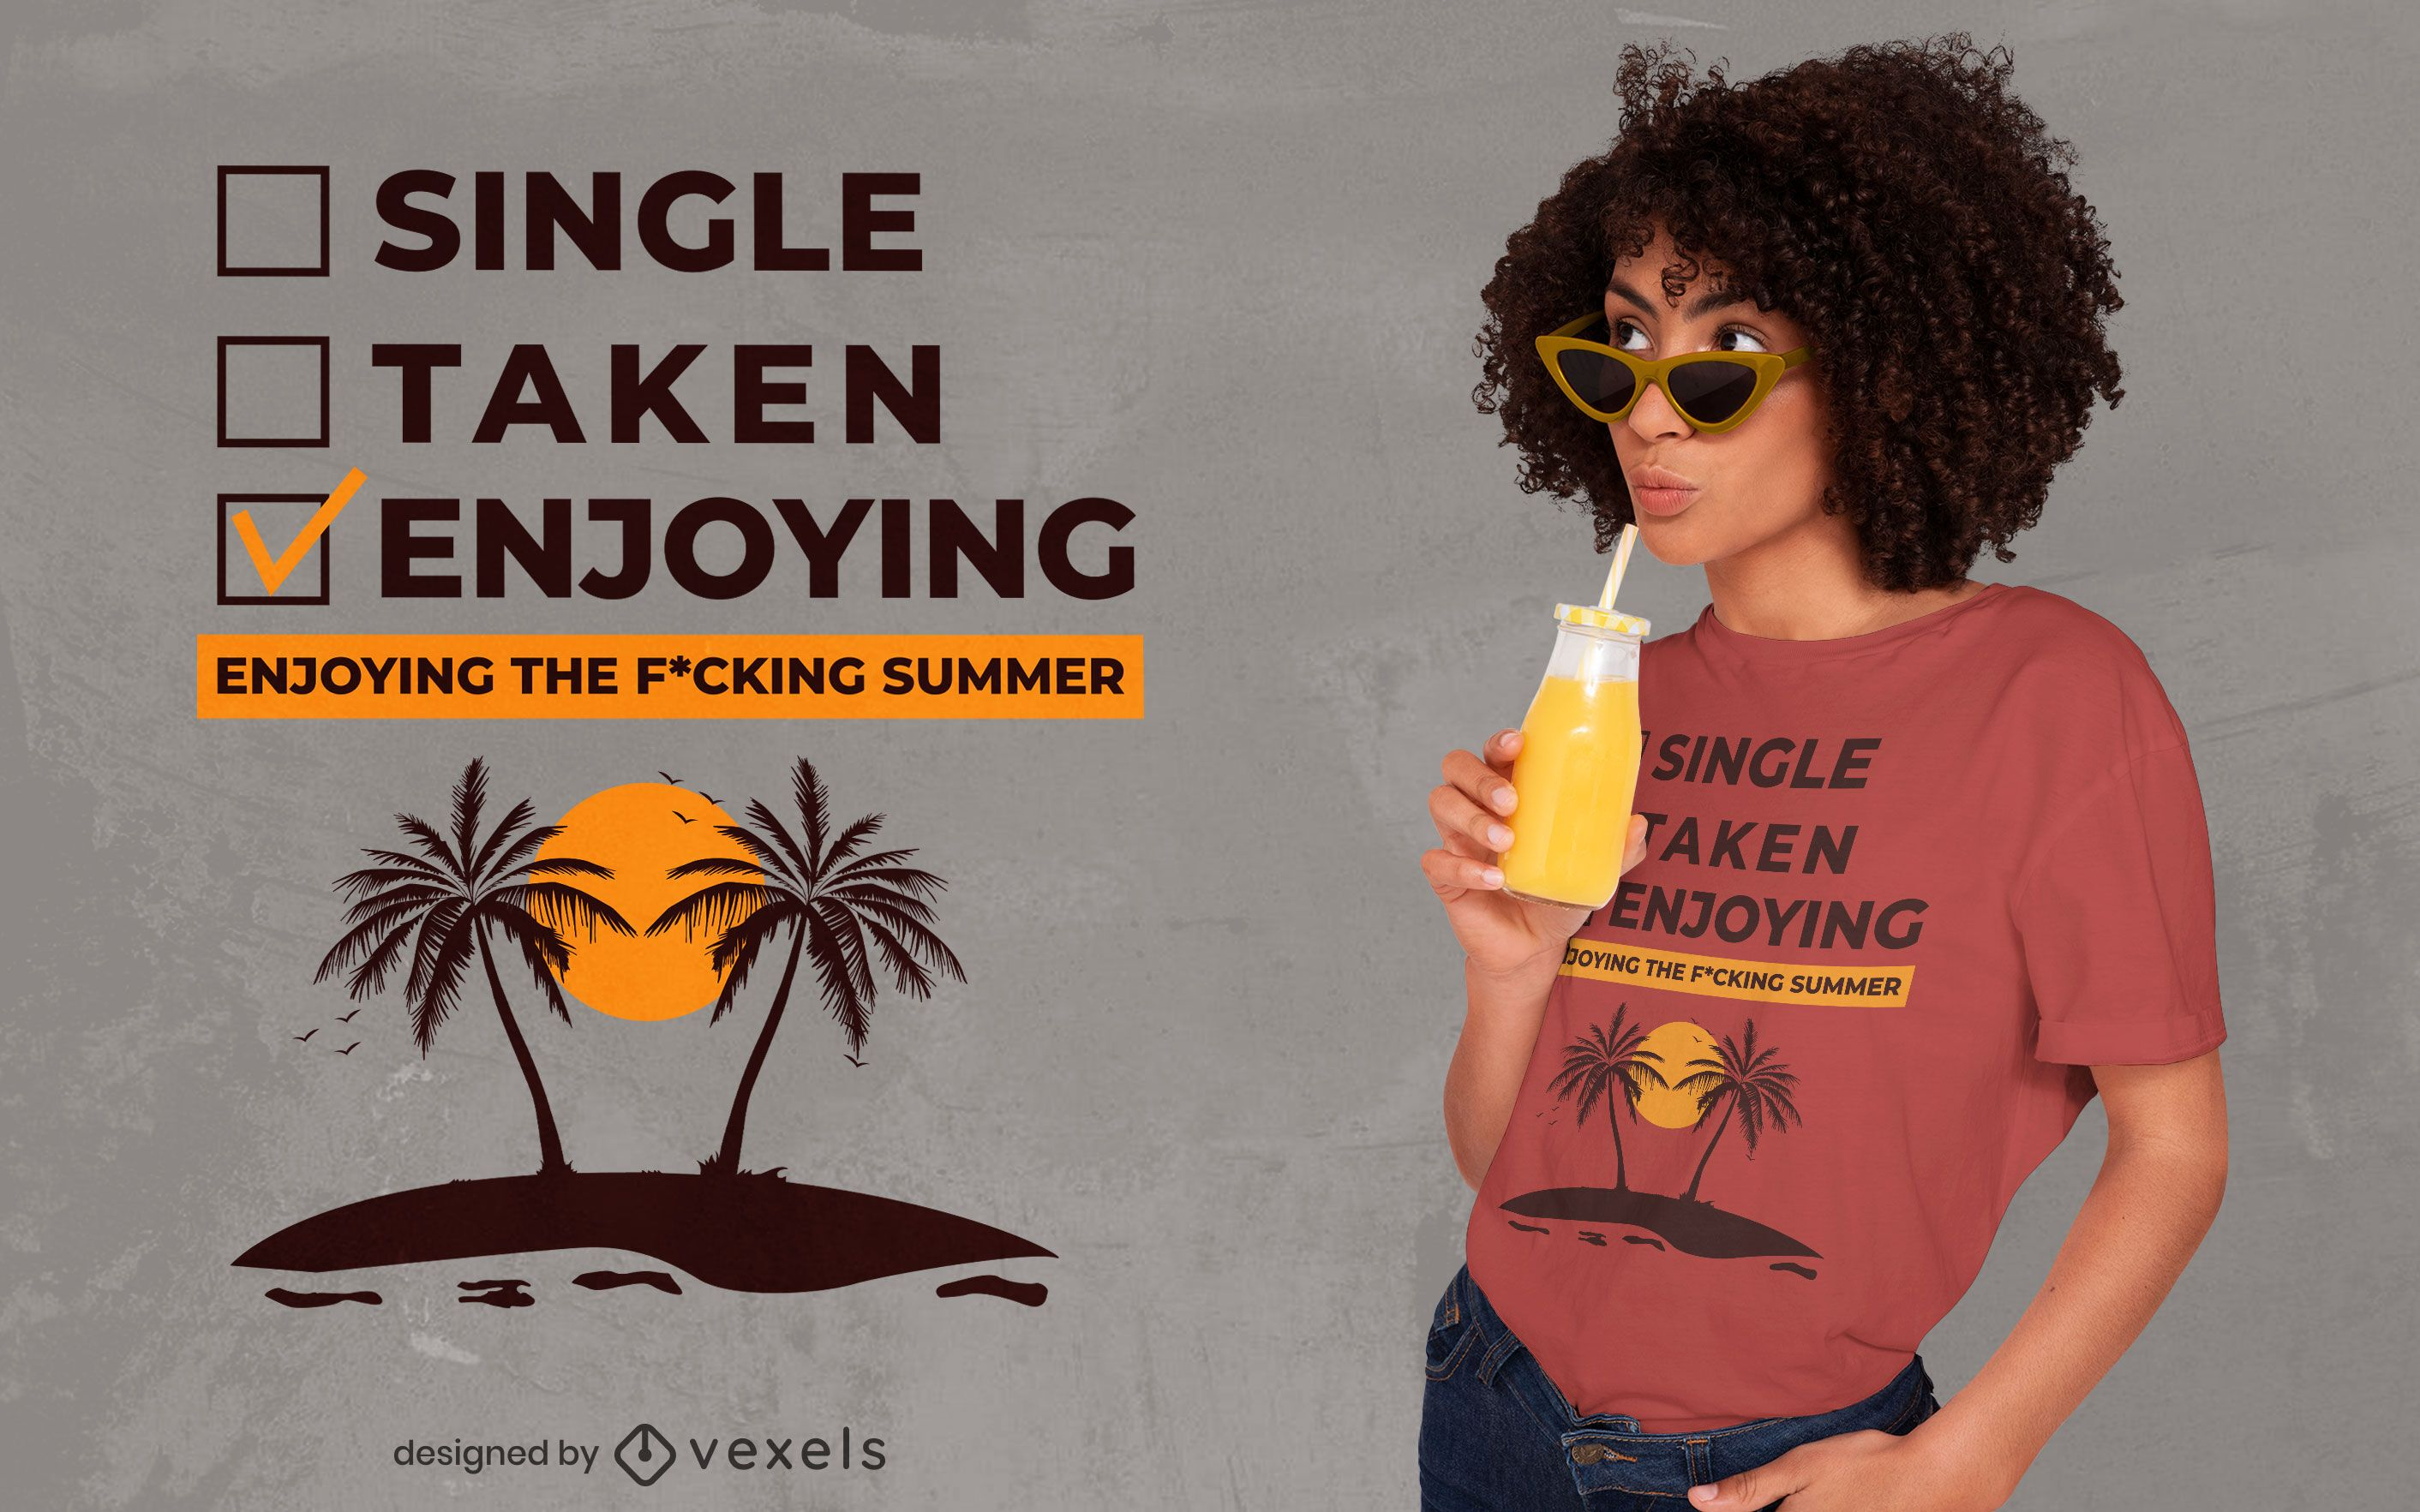 Enjoying summer quote t-shirt design